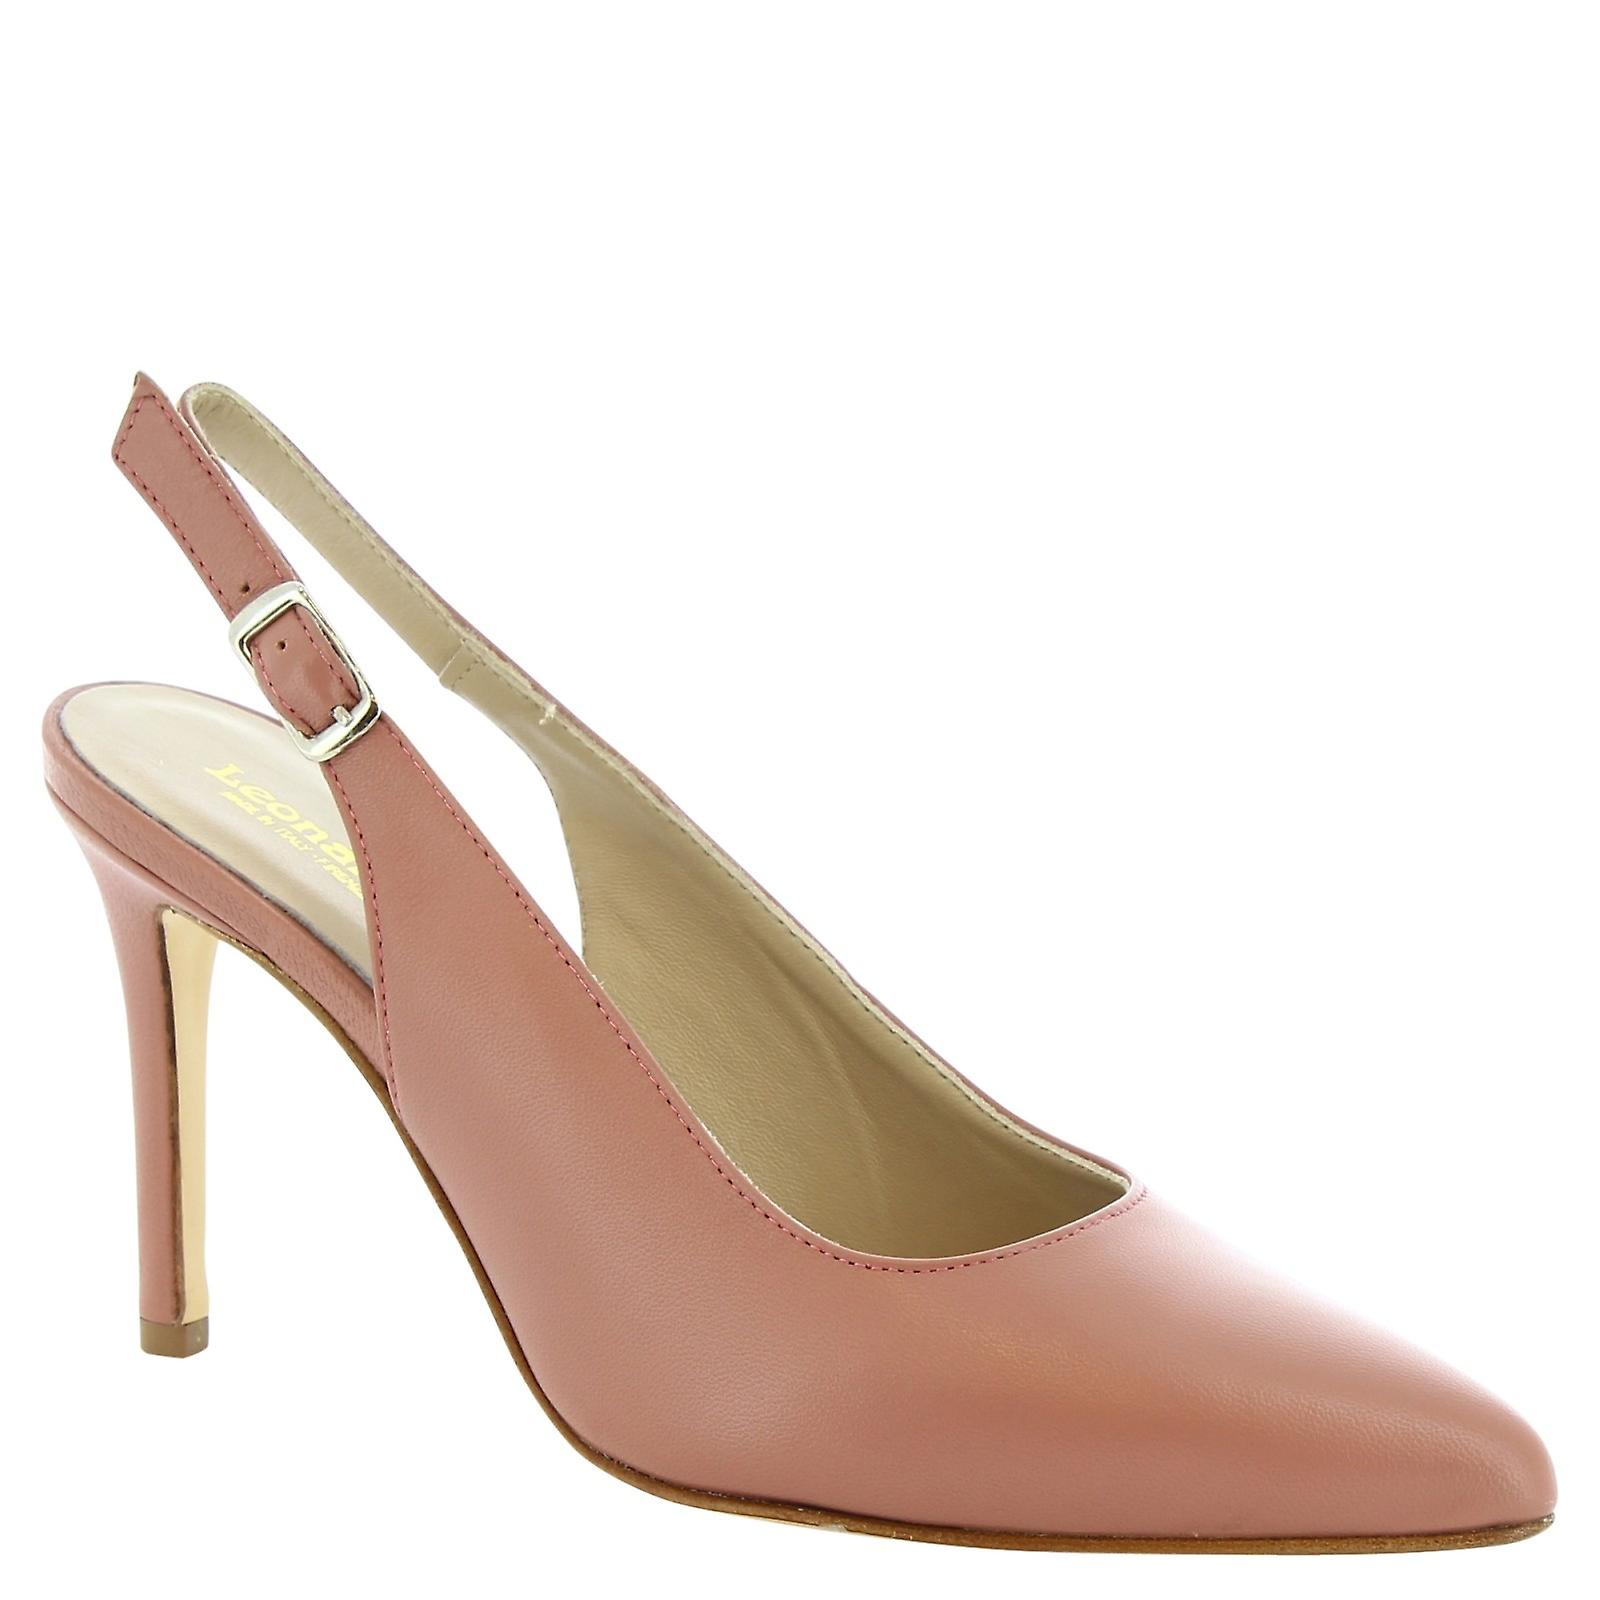 Leonardo Shoes Women's handmade slingbacks in dusty rose calf leather